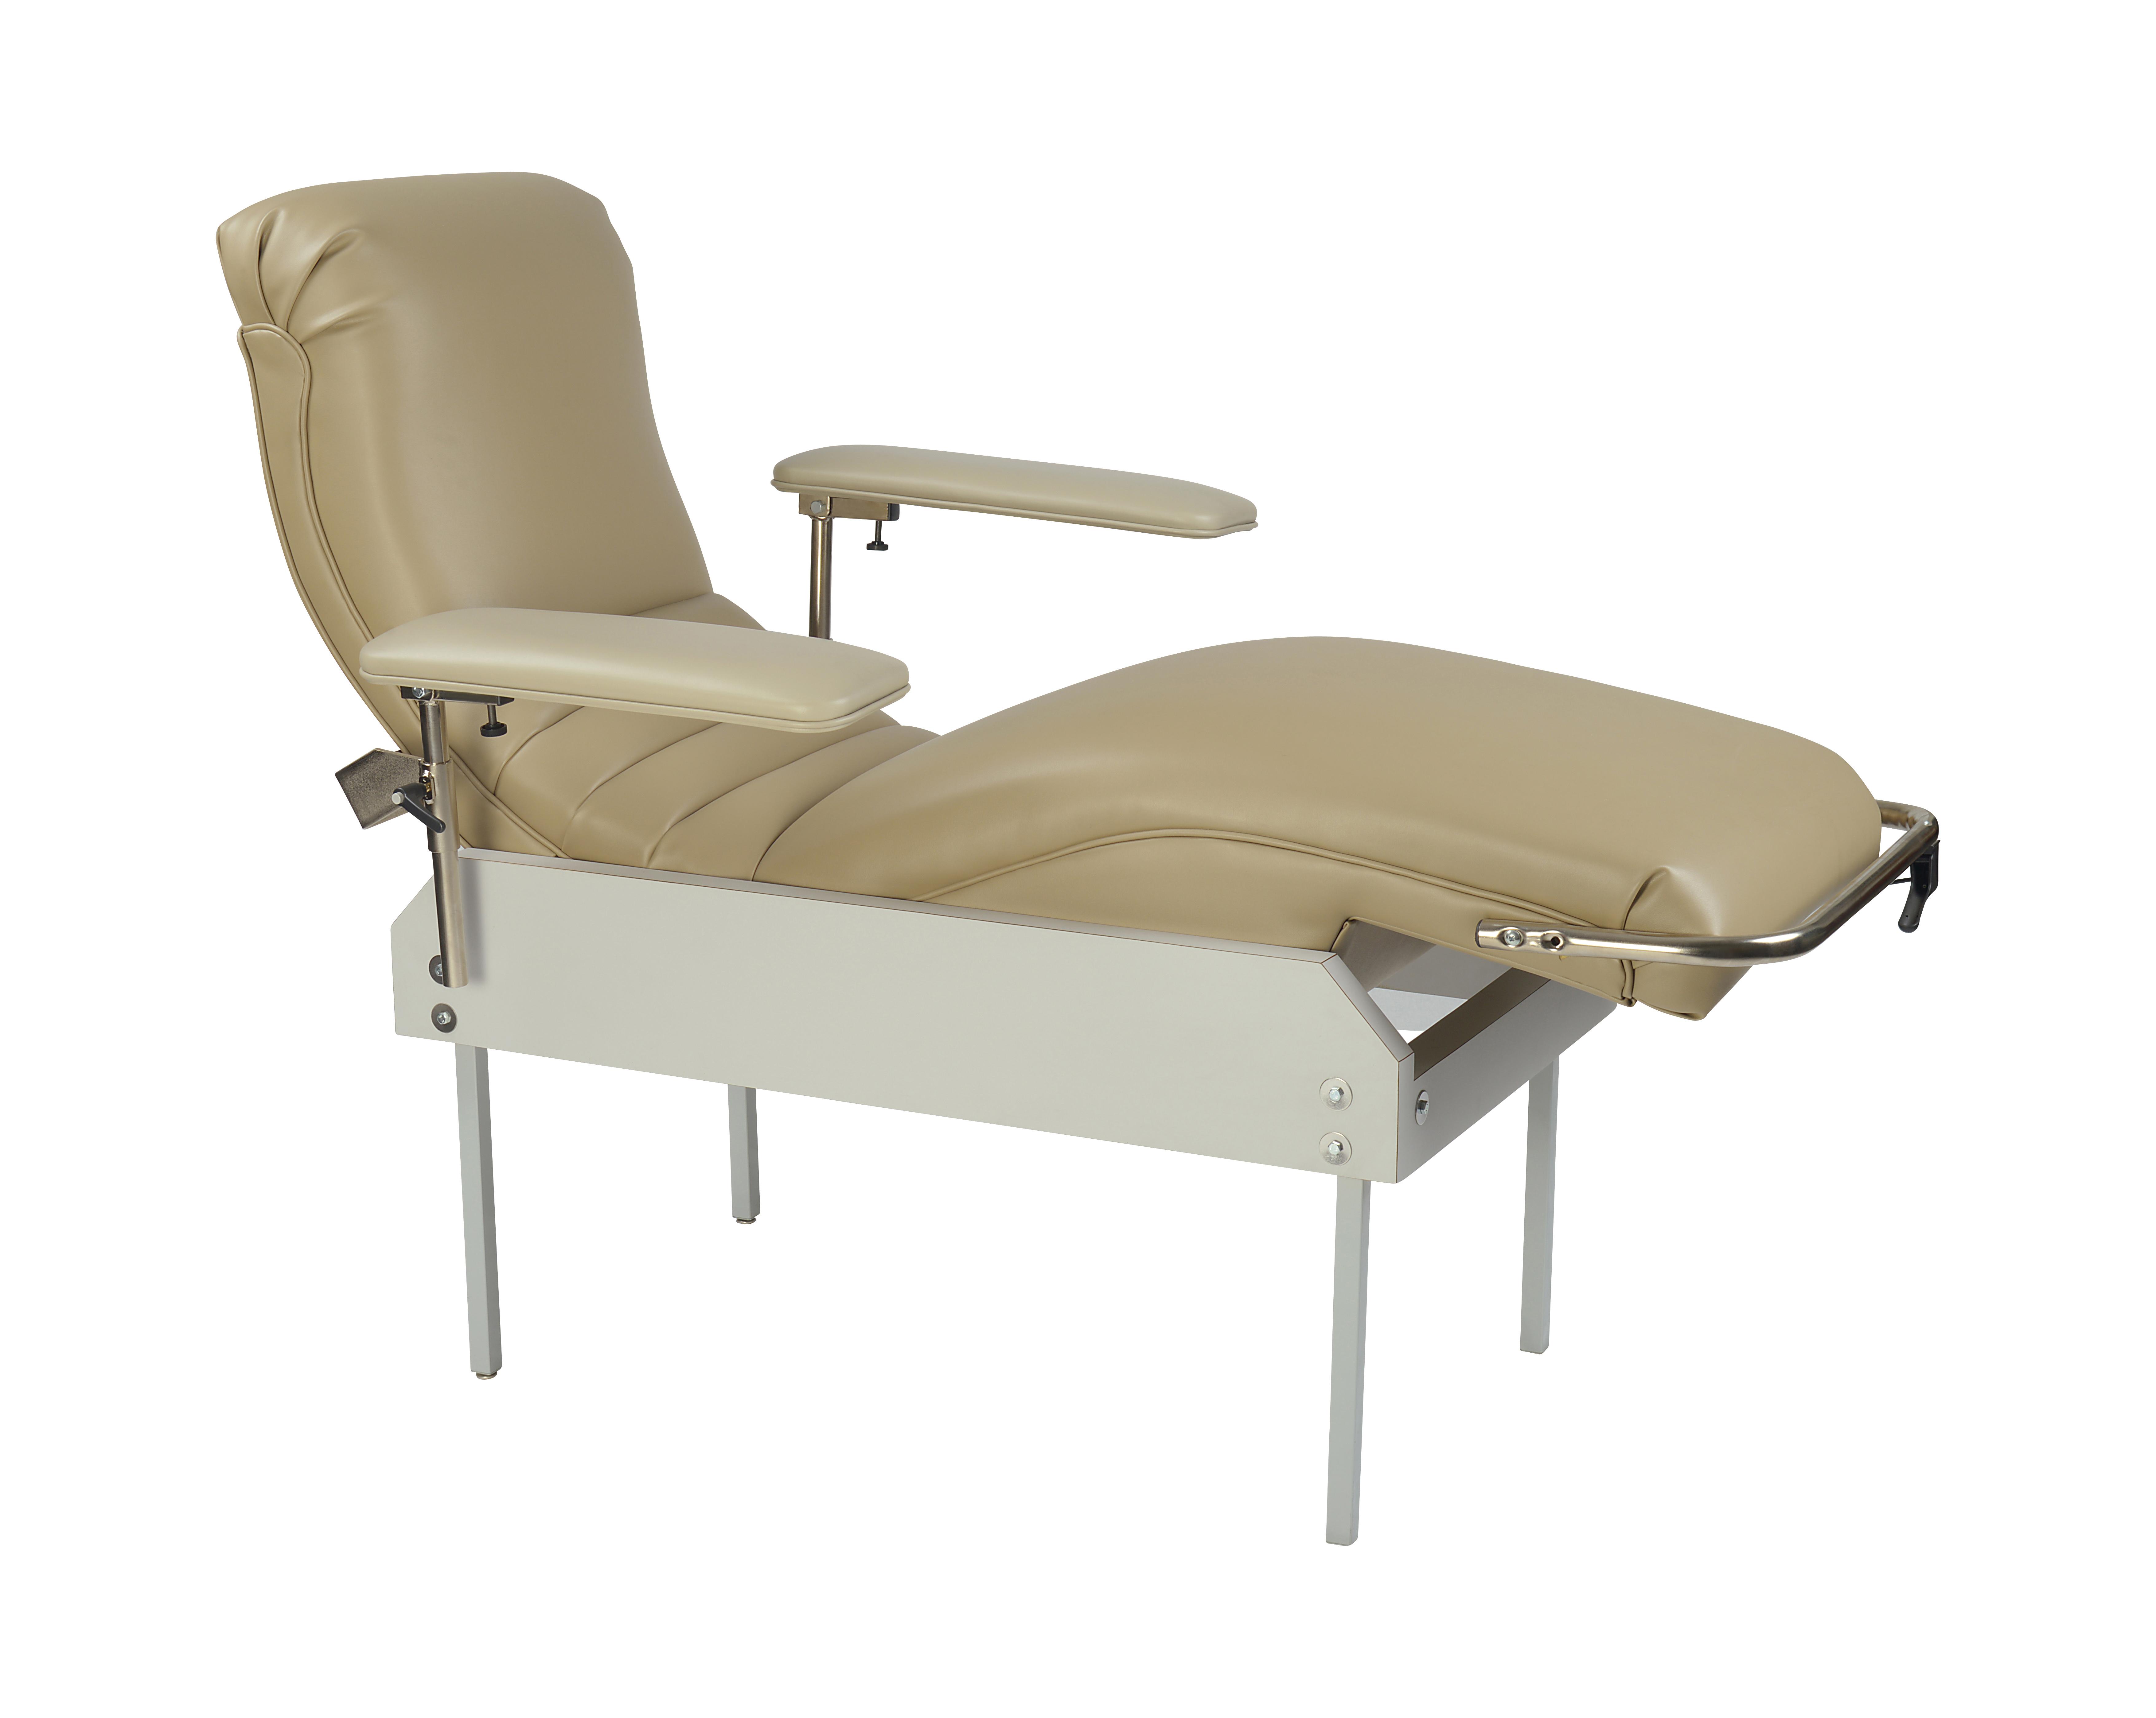 SA1403 Lounge Chairs | Medical Furniture Supplies @ Custom Comfort Medtek